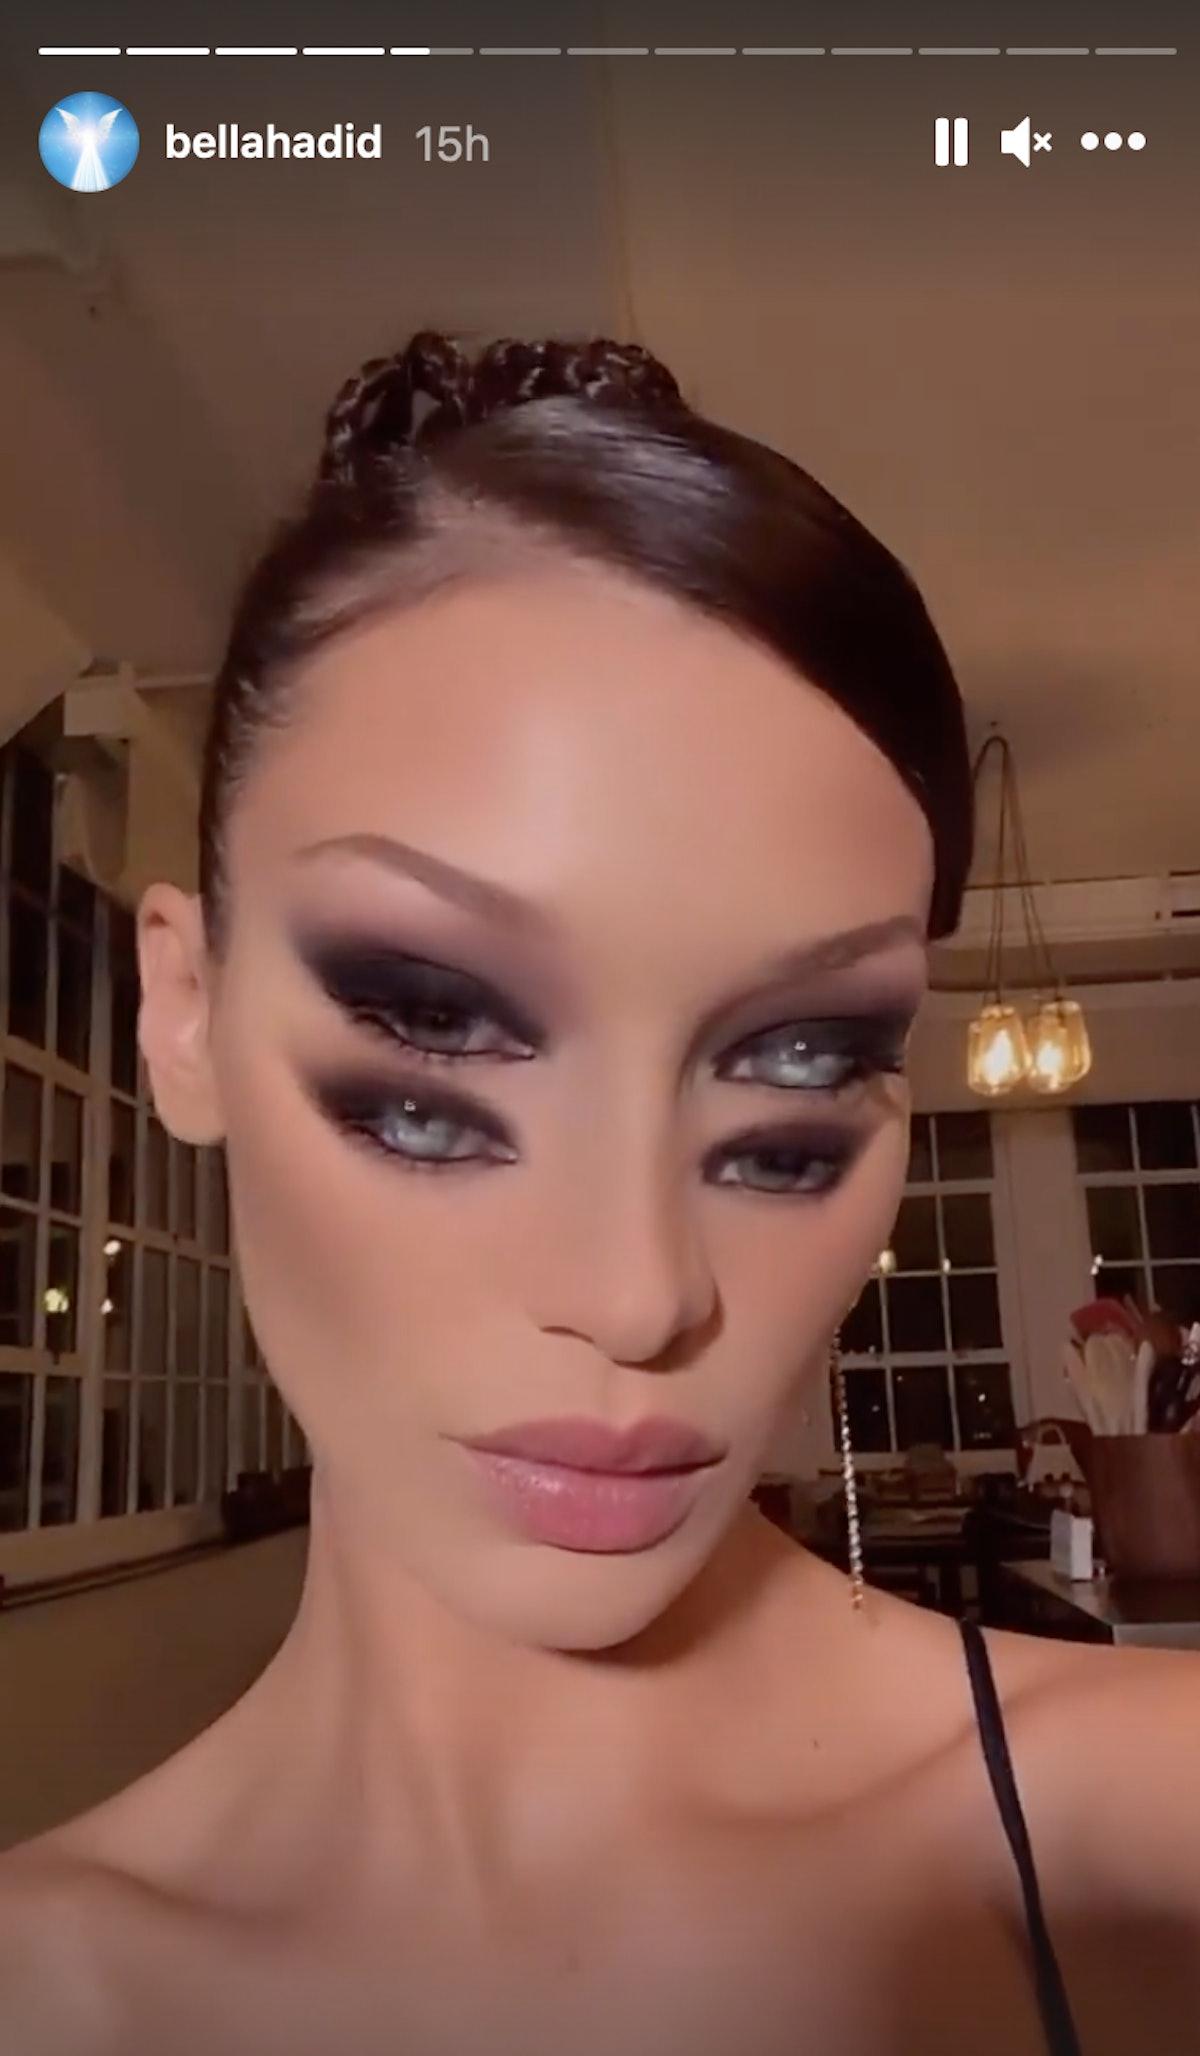 Bella Hadid NYFW smokey eye Instagram story with braided updo